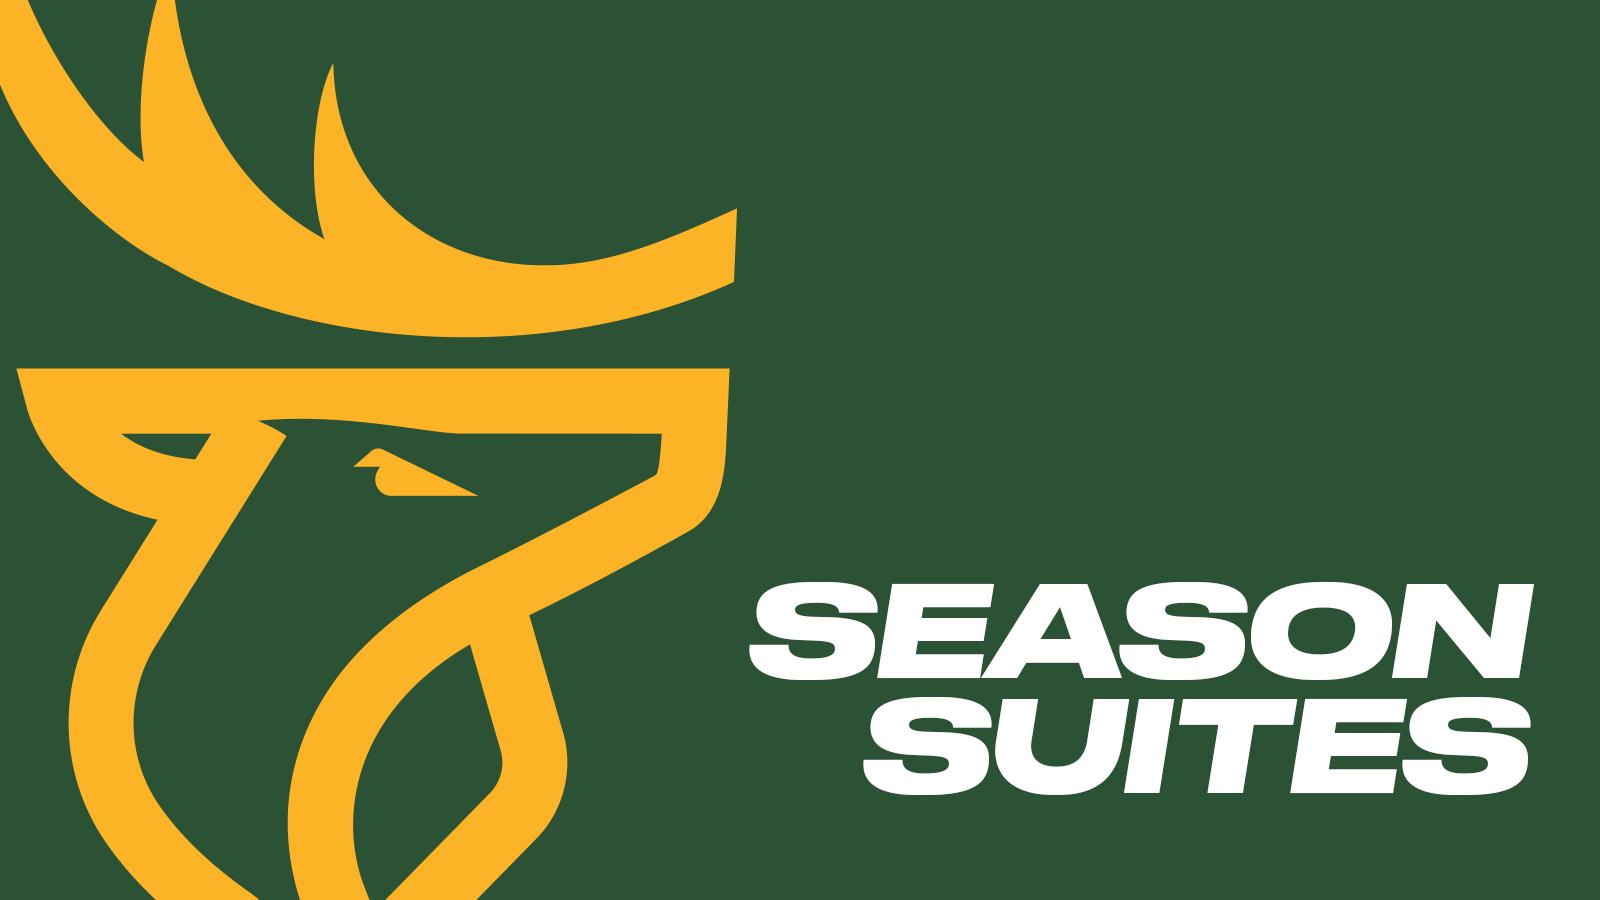 Season Suites